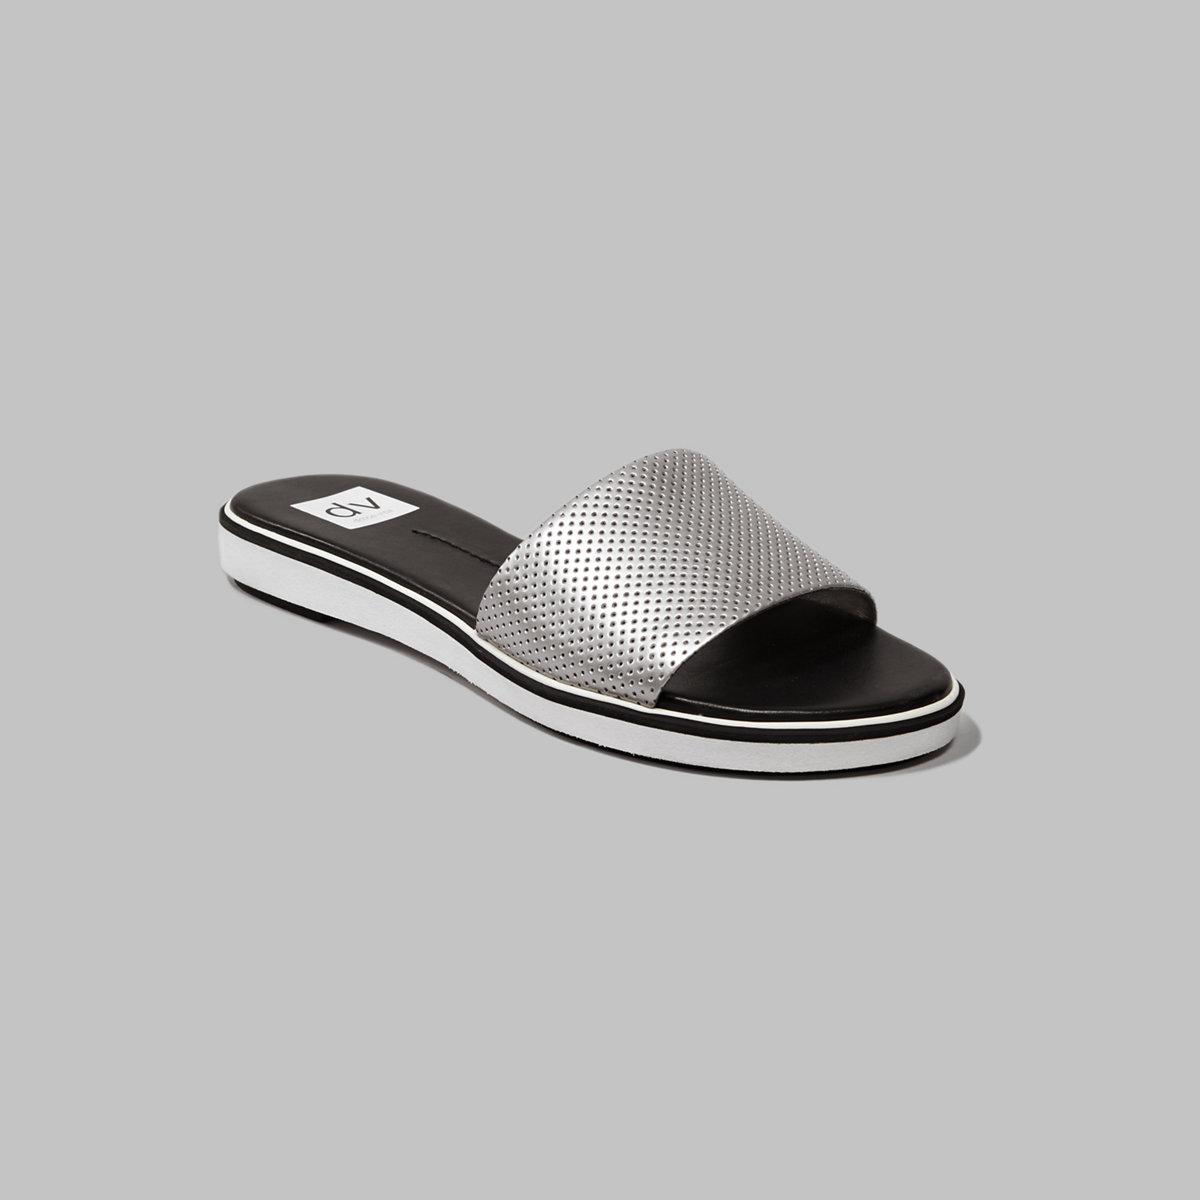 Dolce Vita Breeze Sandals